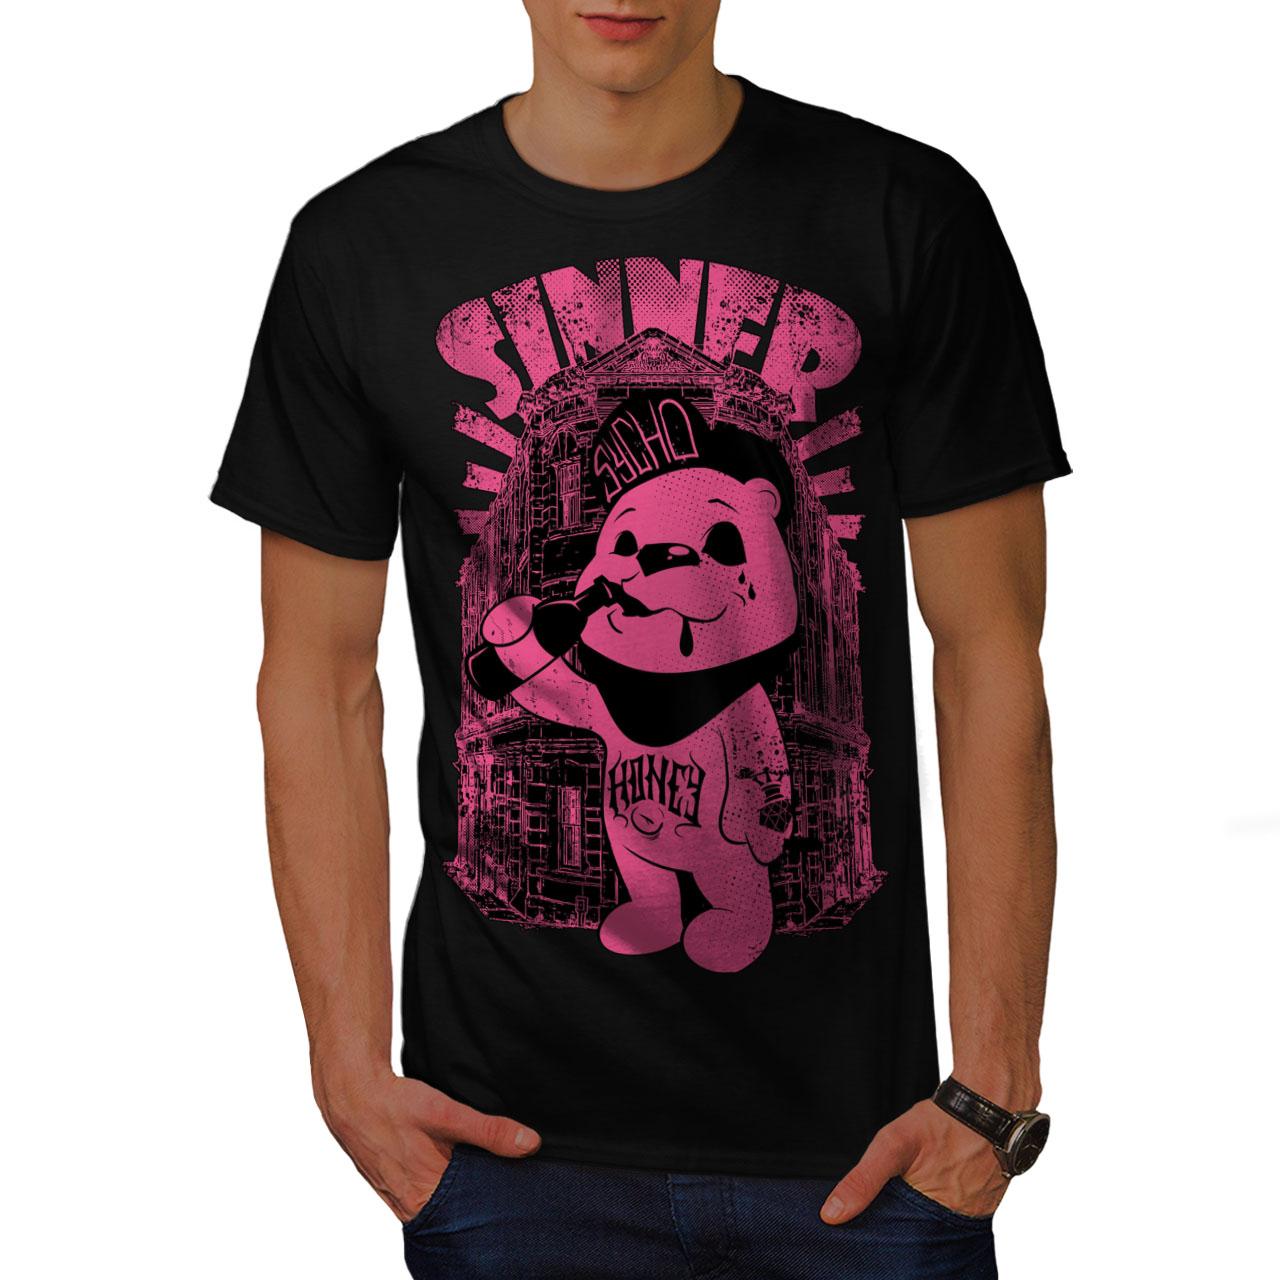 Psycho Graphic Design Wellcoda Sinner Teddy Ted Bear Mens Long Sleeve T-shirt